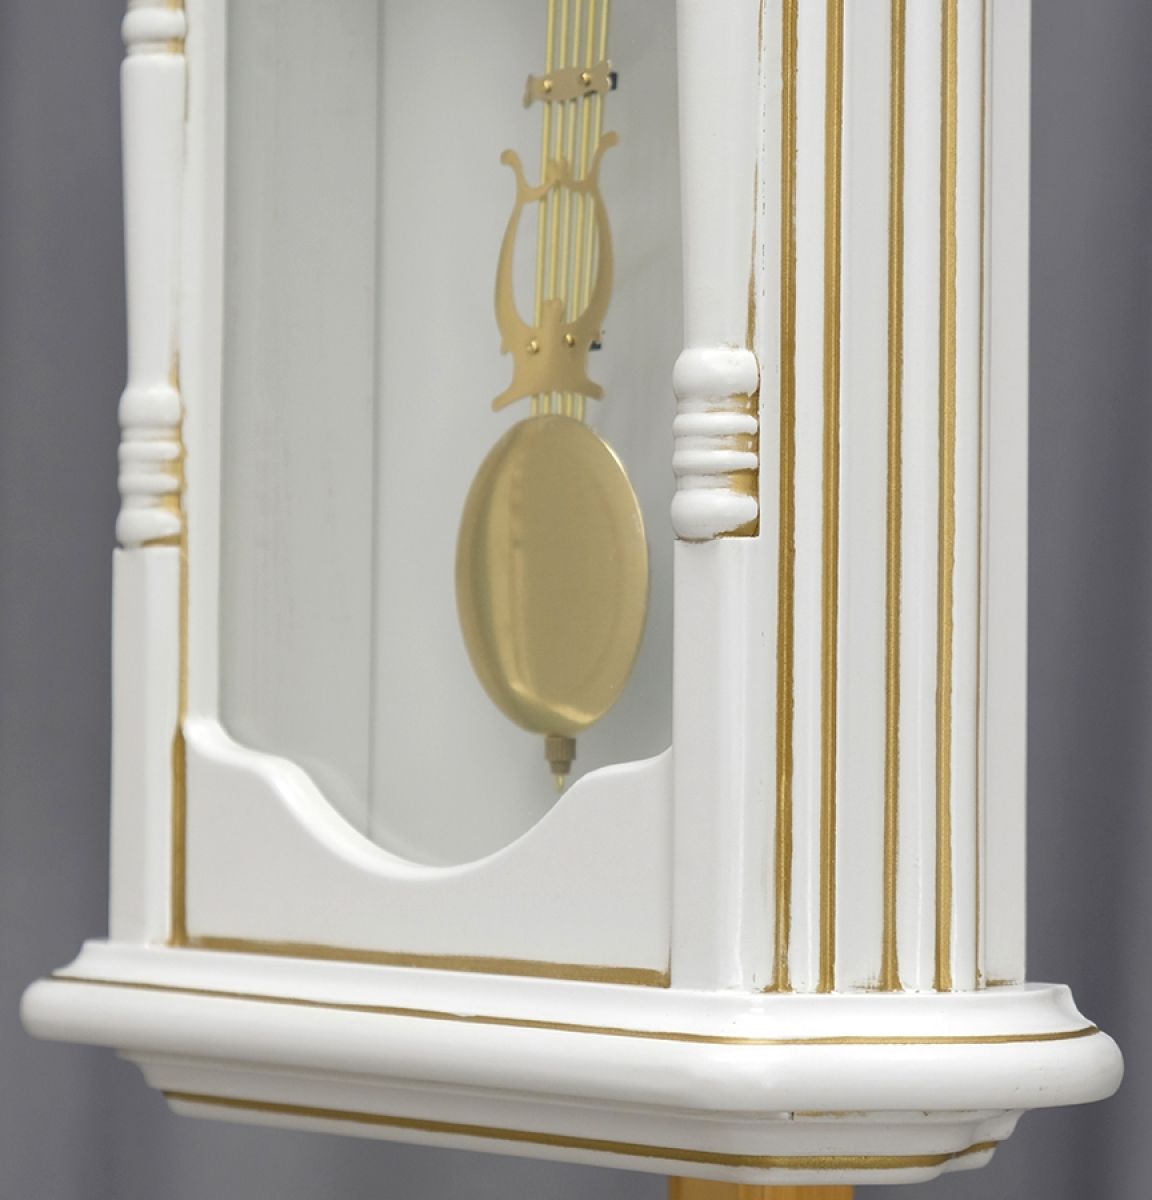 Настенные часы Columbus Co-1890-PG-Wh с маятником и боем